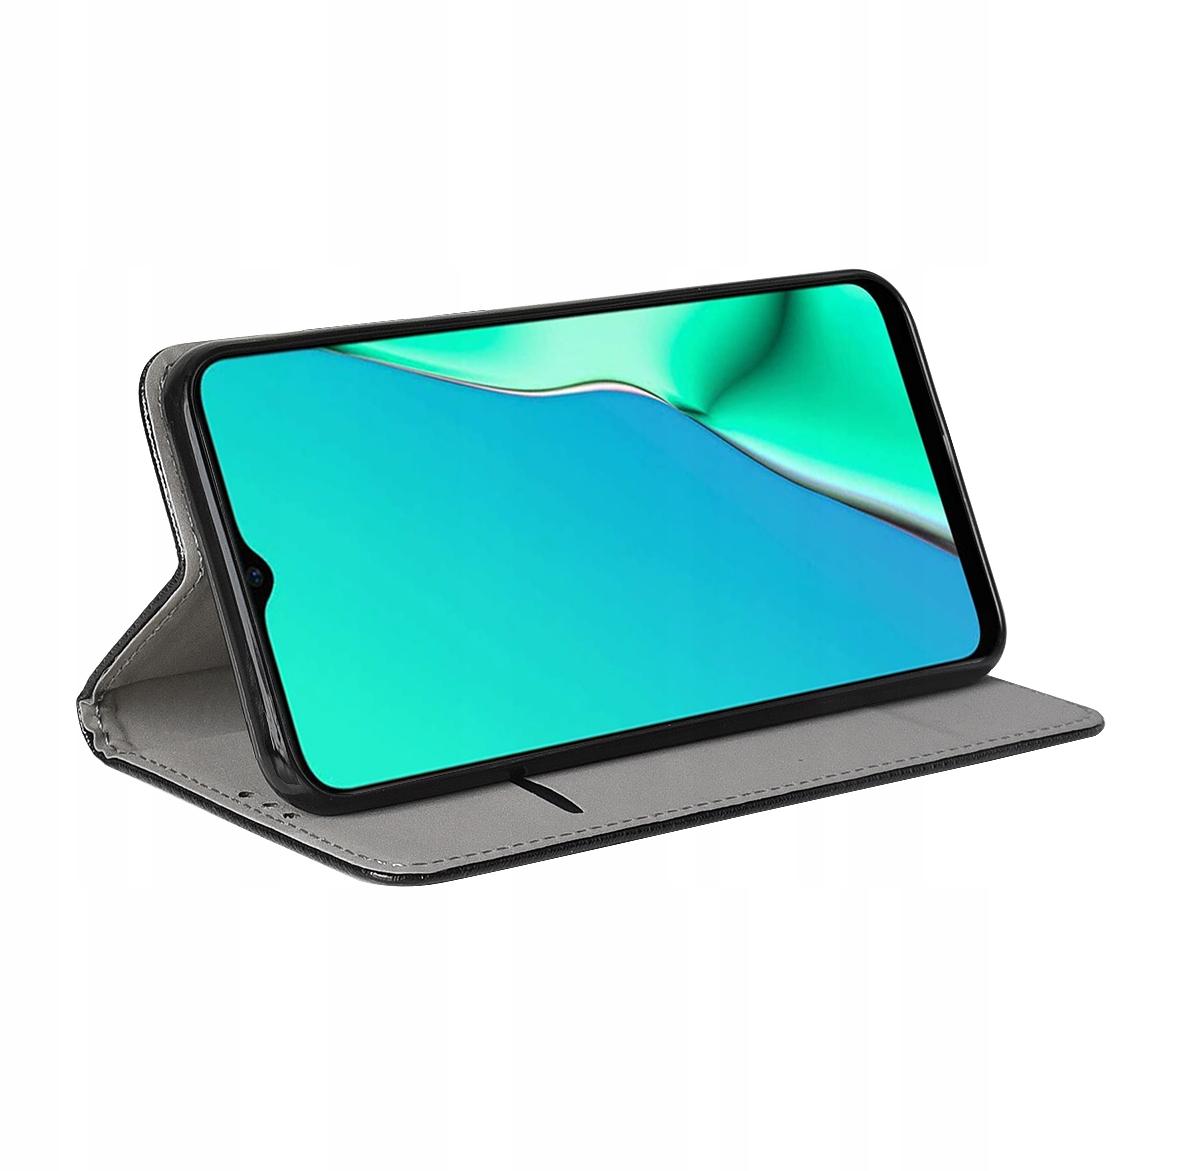 Etui do Oppo A9 2020 Case Magnet Portfel + Szkło Producent KrainaGSM